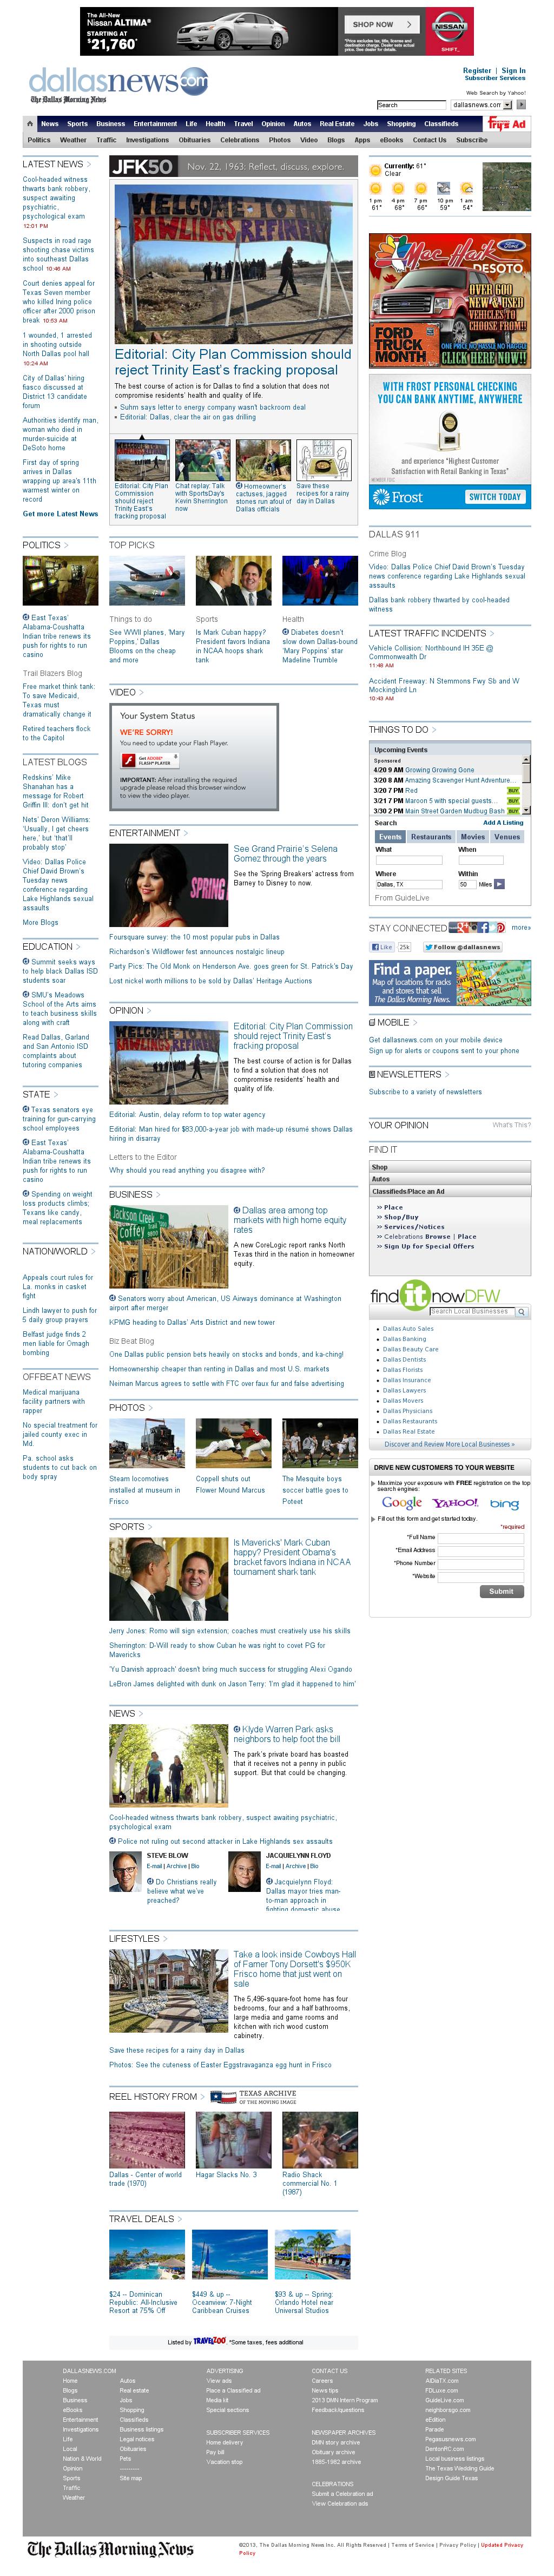 dallasnews.com at Wednesday March 20, 2013, 5:06 p.m. UTC